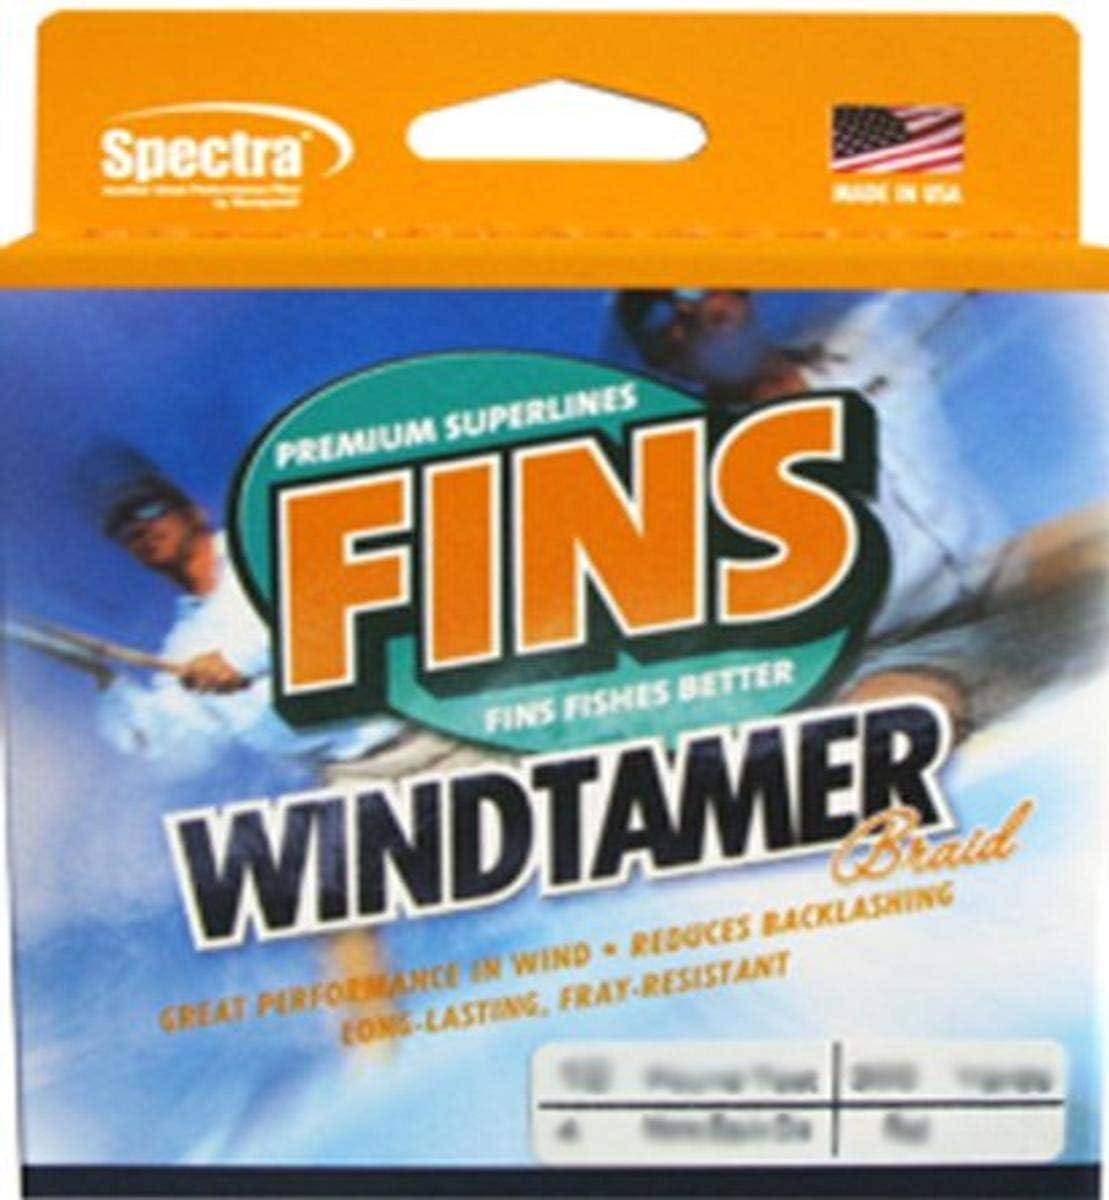 Fins Spectra 300-Yards Fishing Windtamer San Super sale period limited Antonio Mall Line